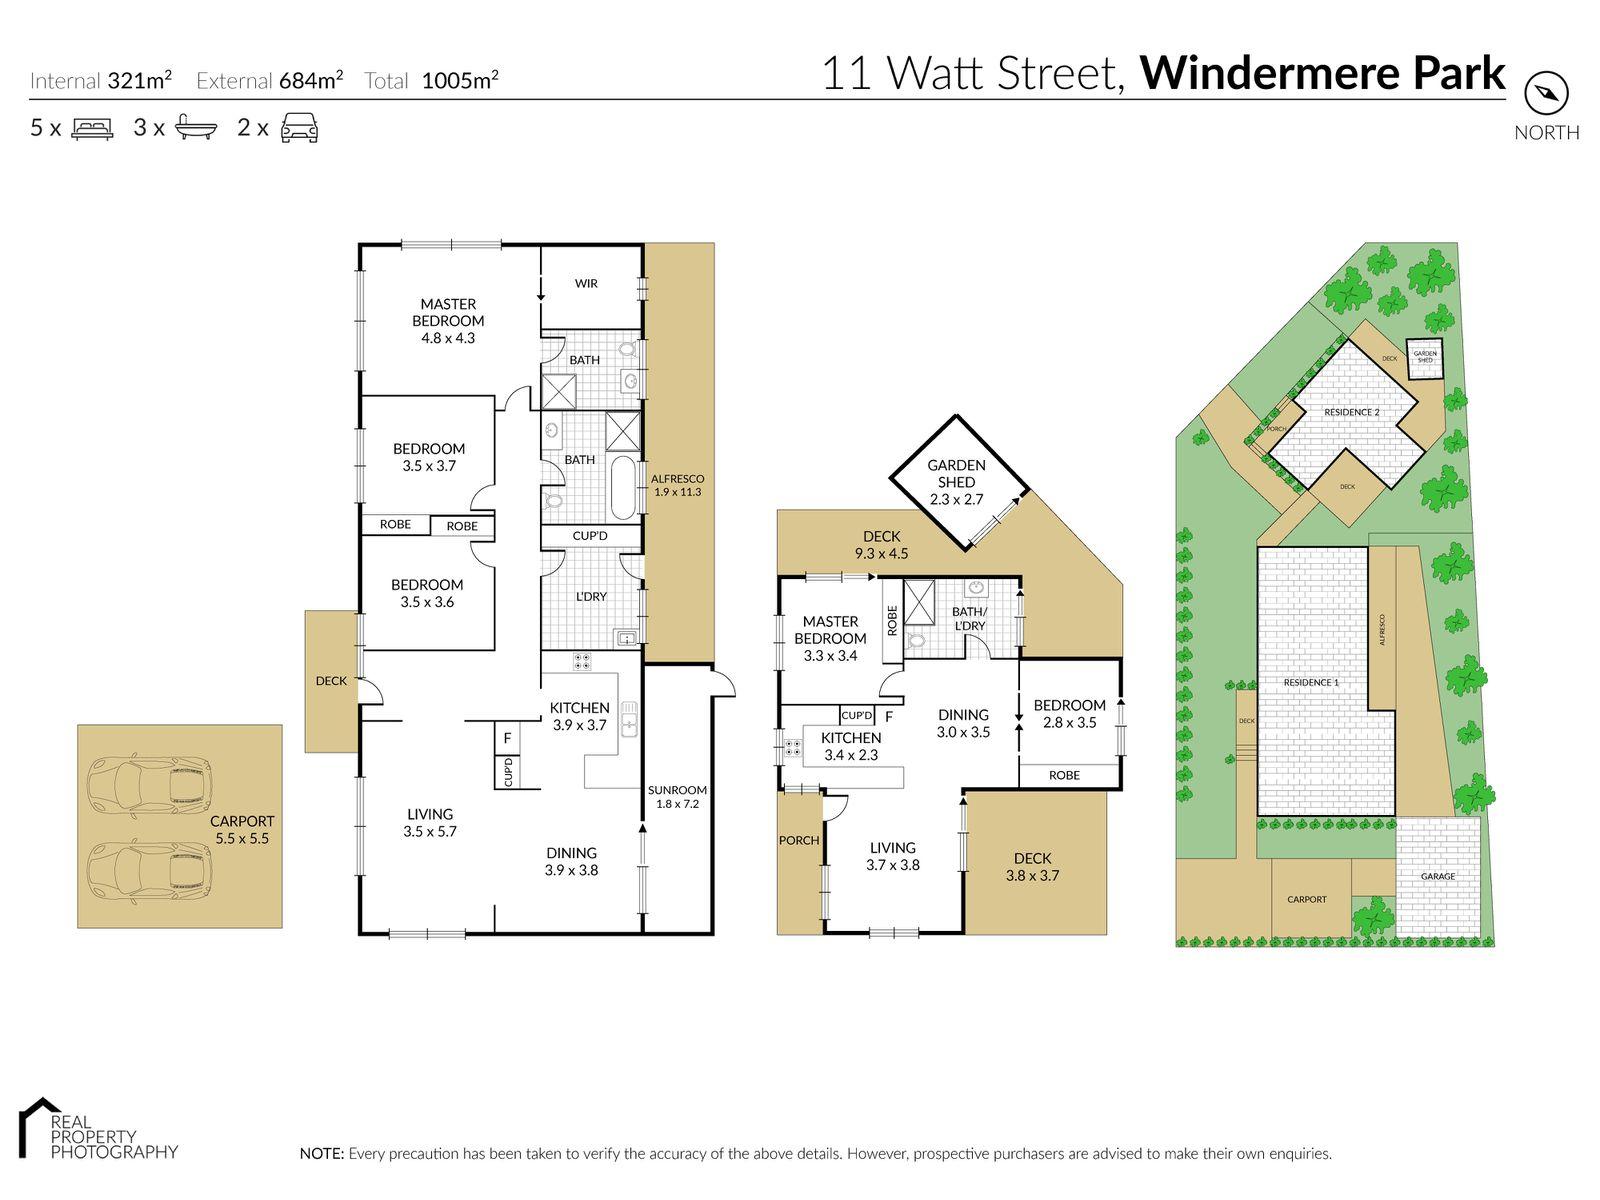 11 Watt Street, Windermere Park